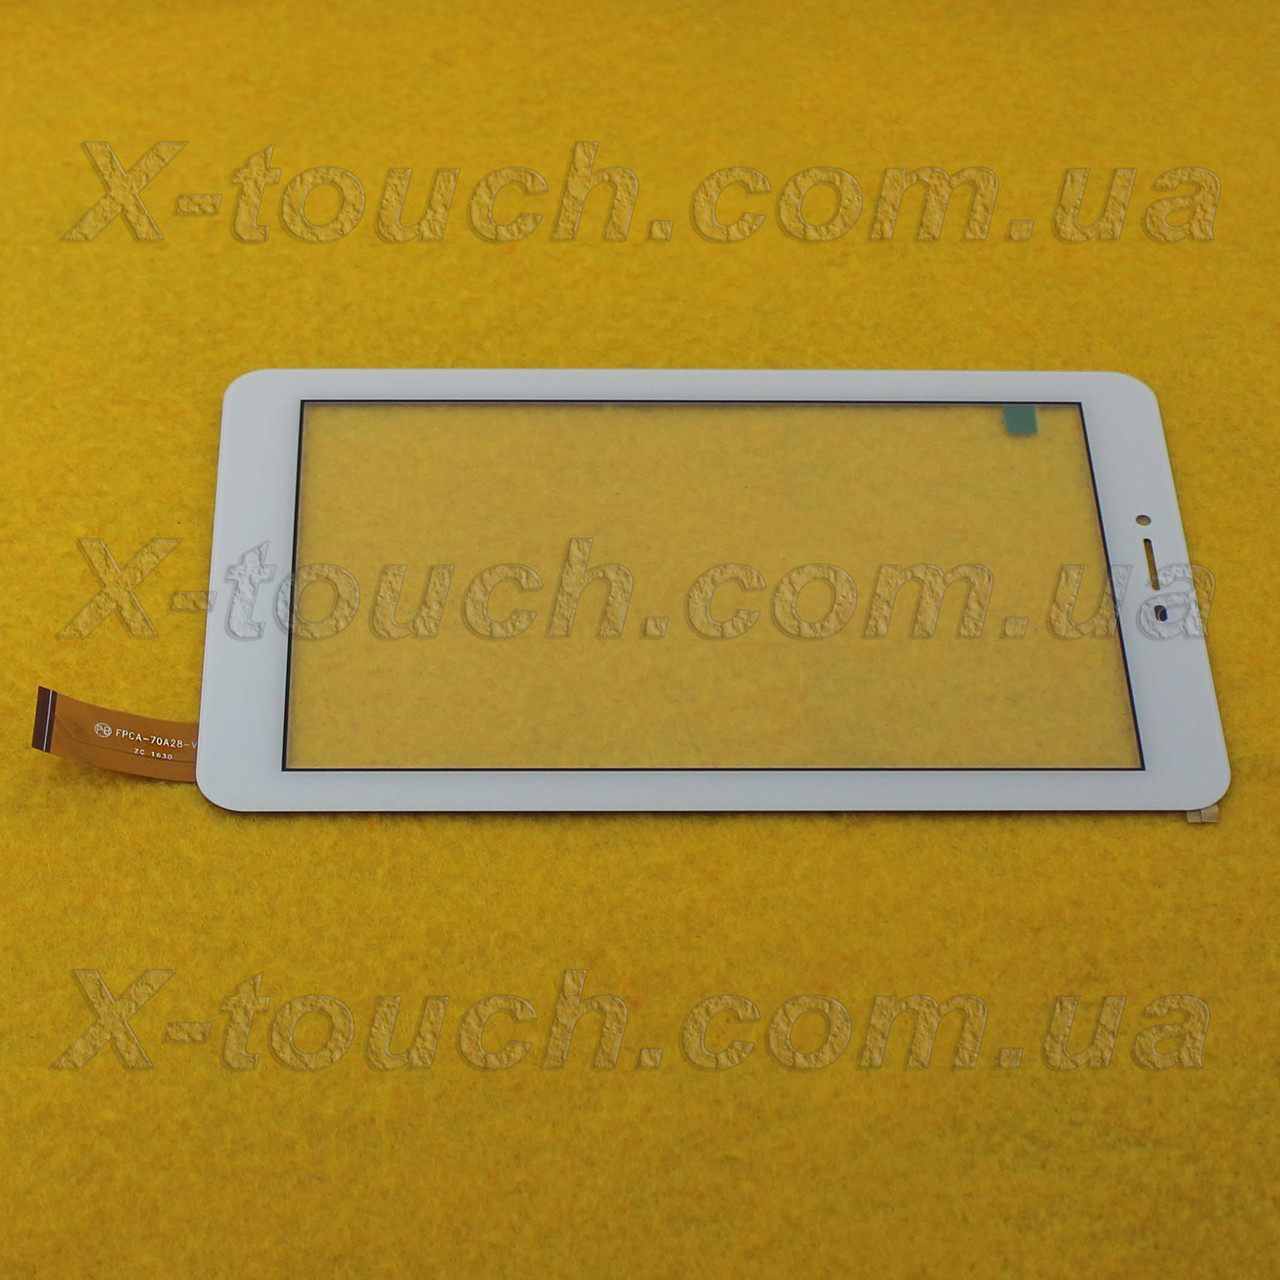 Тачскрин, сенсор FPCA-70A28-V01 Белый для планшета